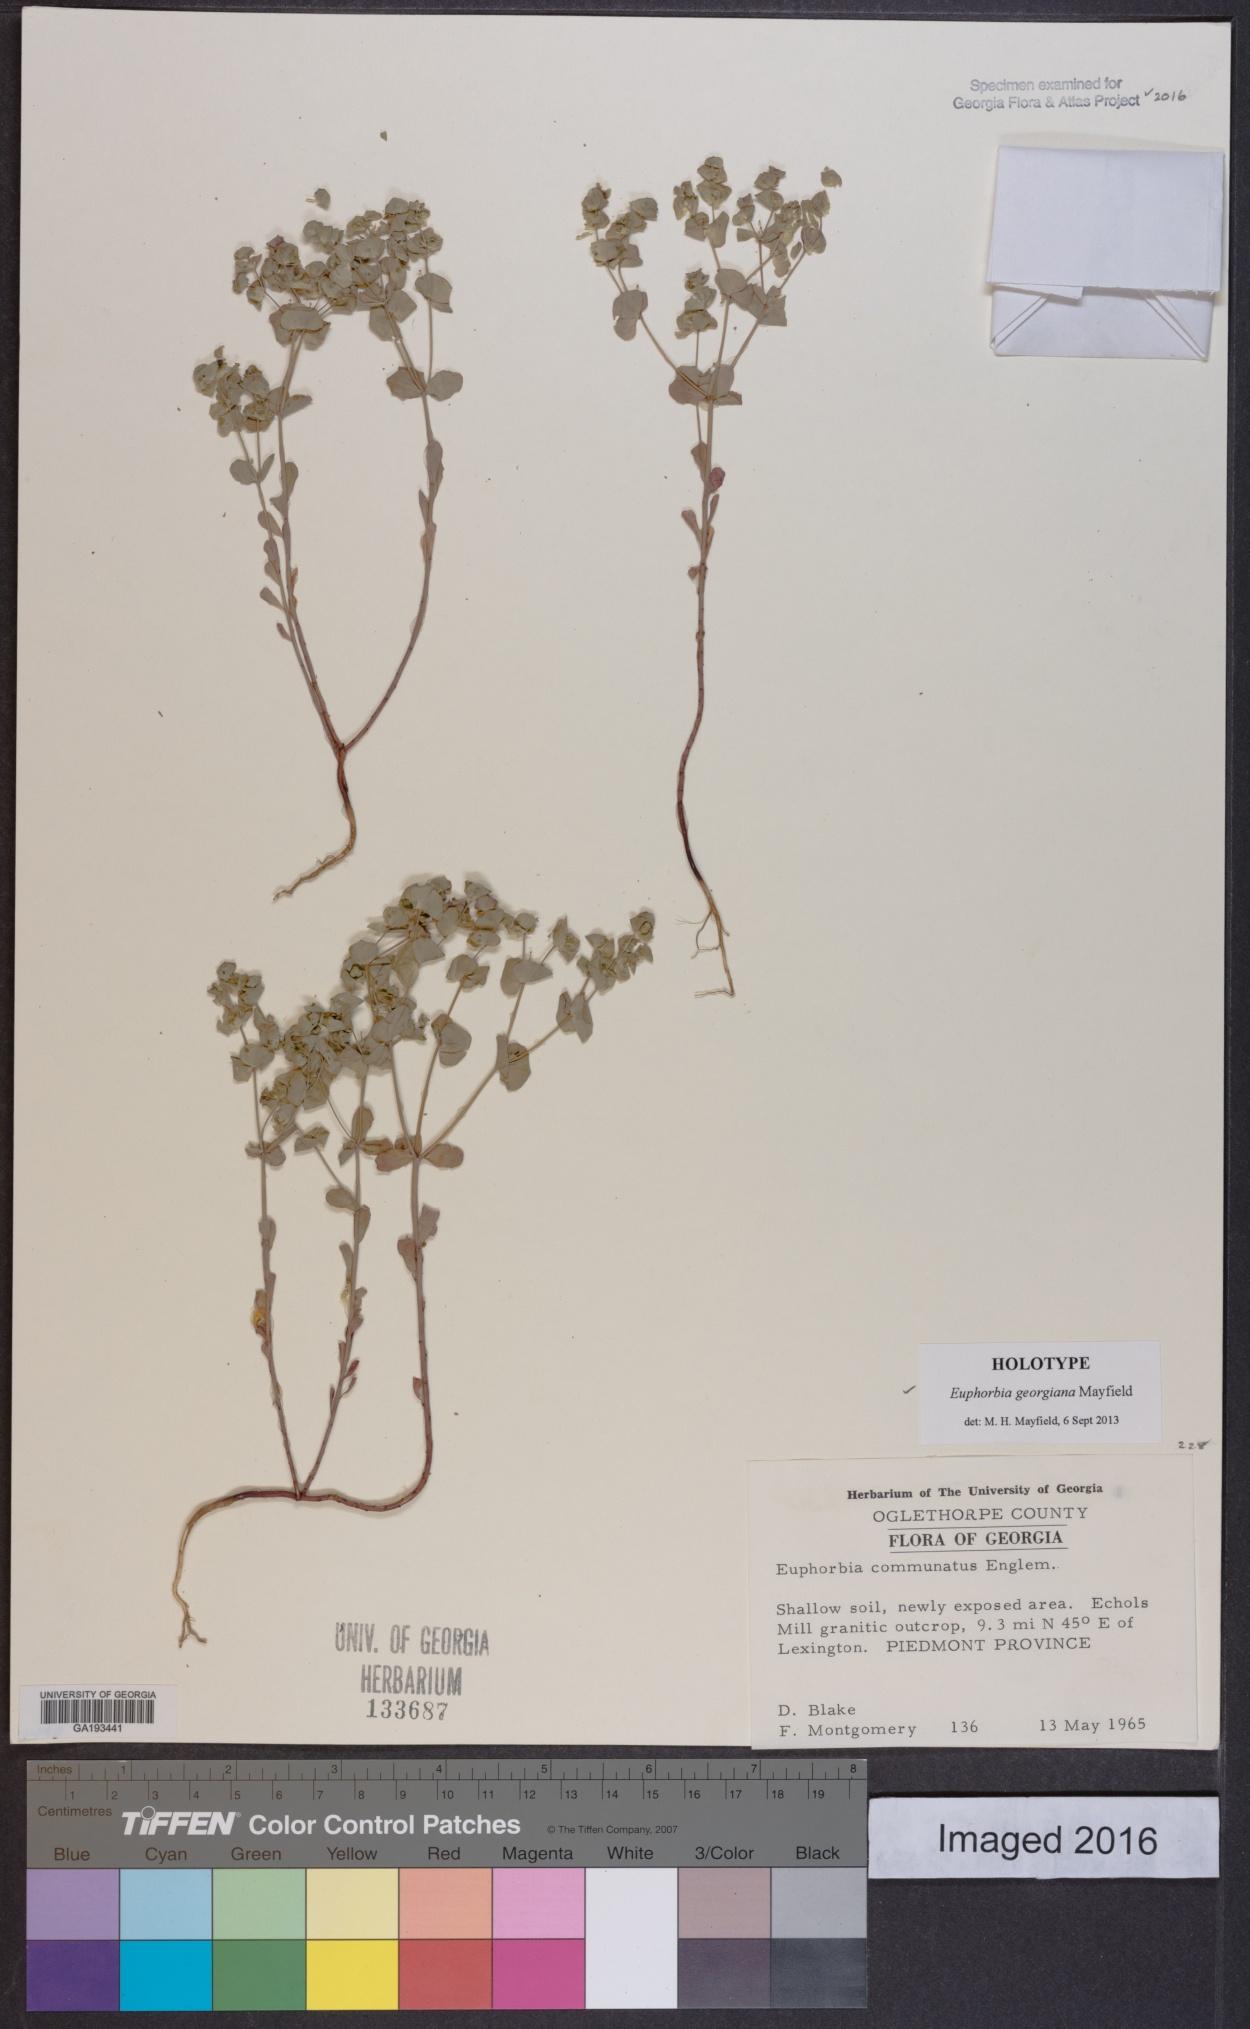 Euphorbia georgiana image